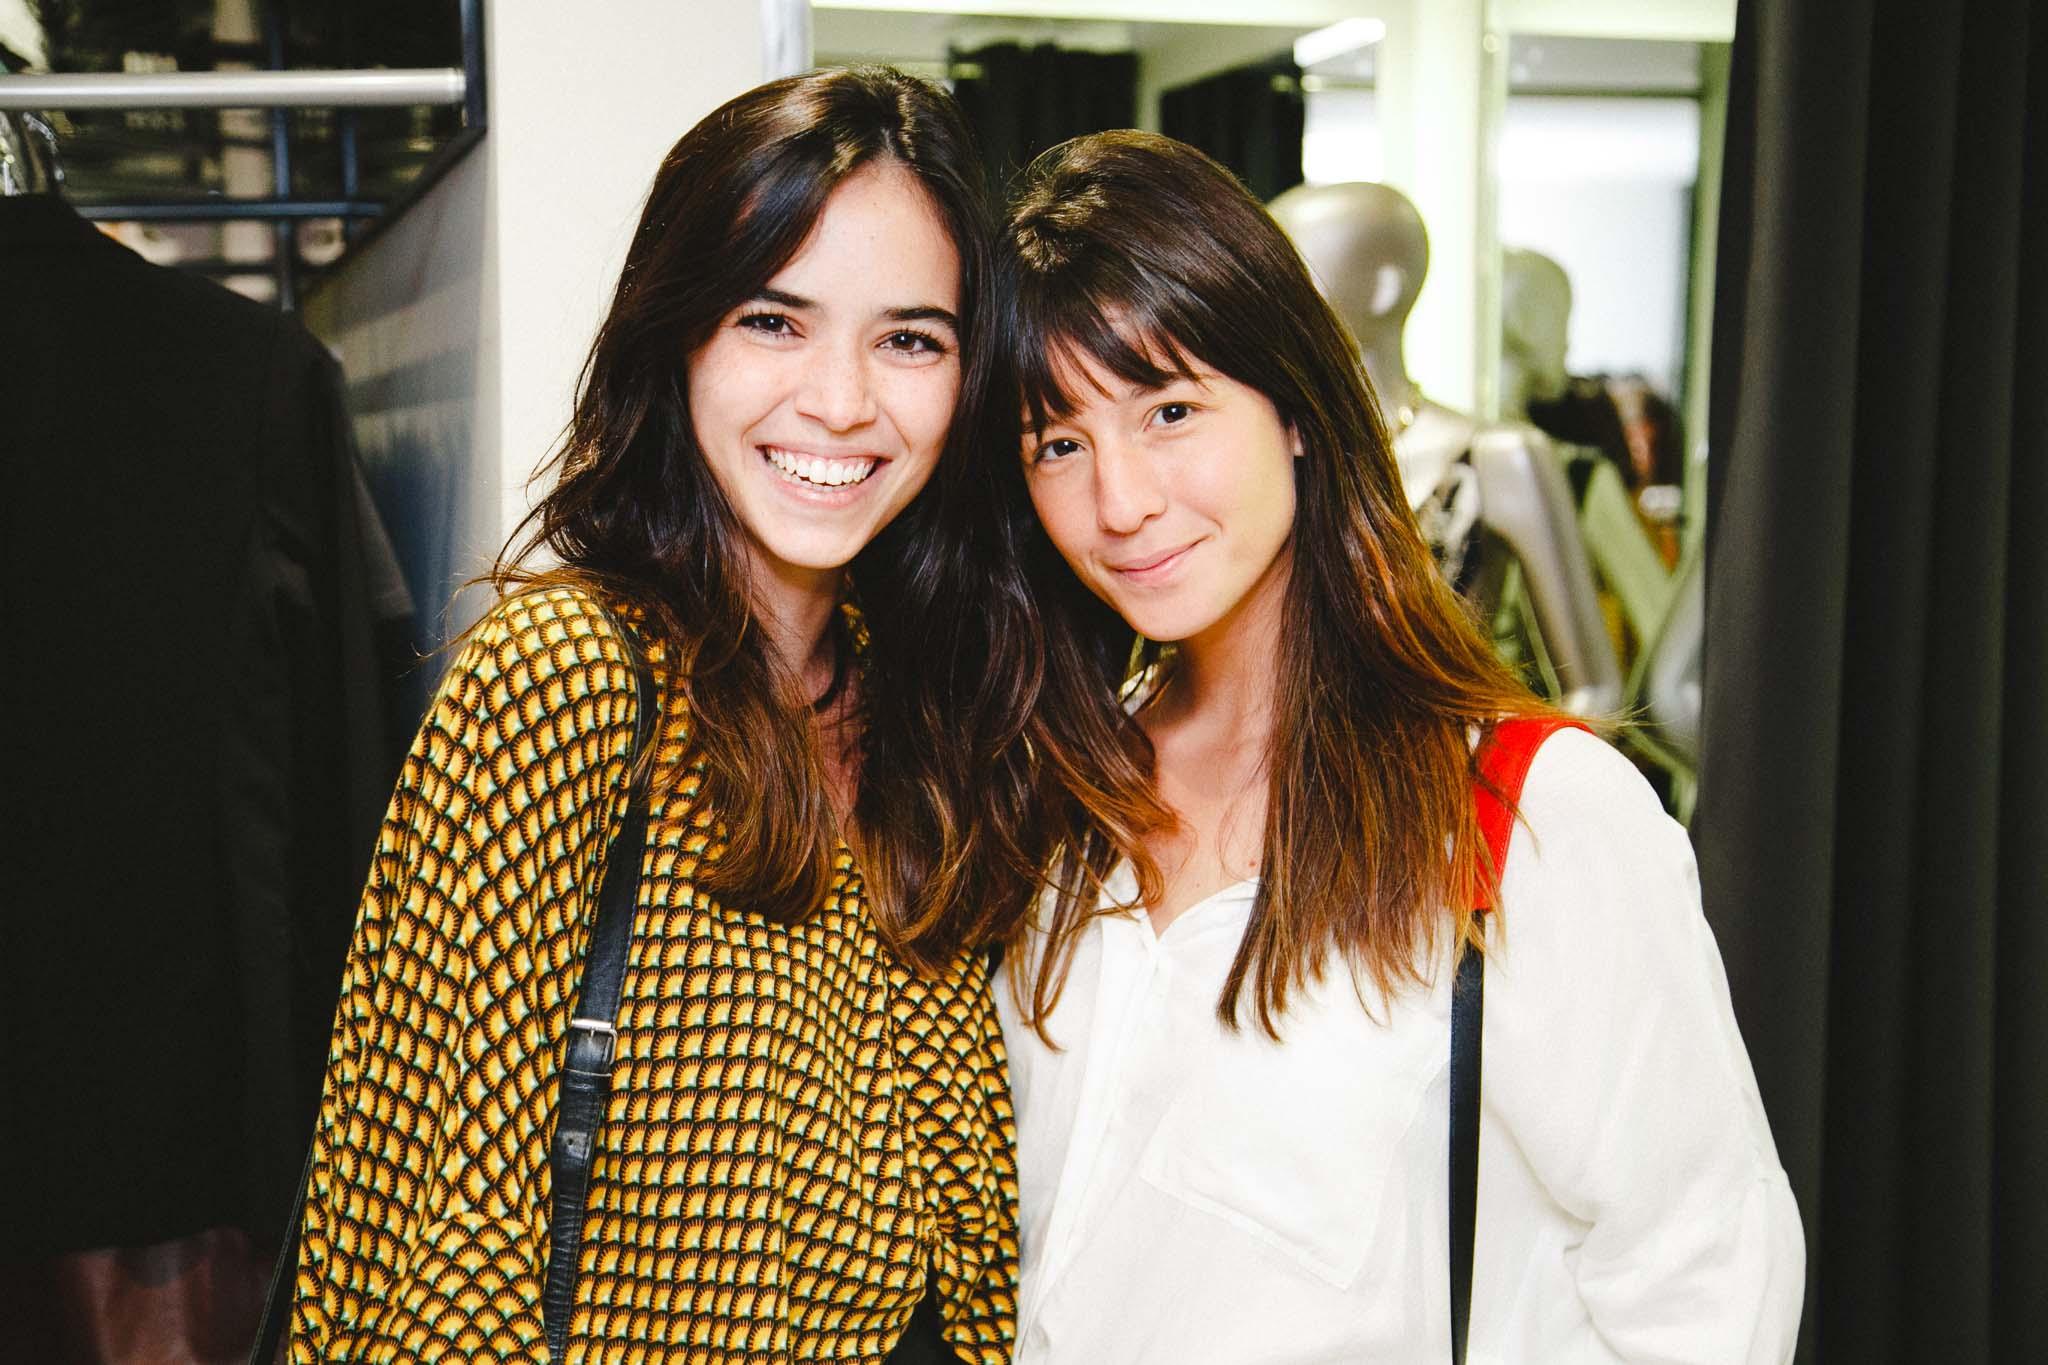 Fernanda Prestes e Larissa Busch